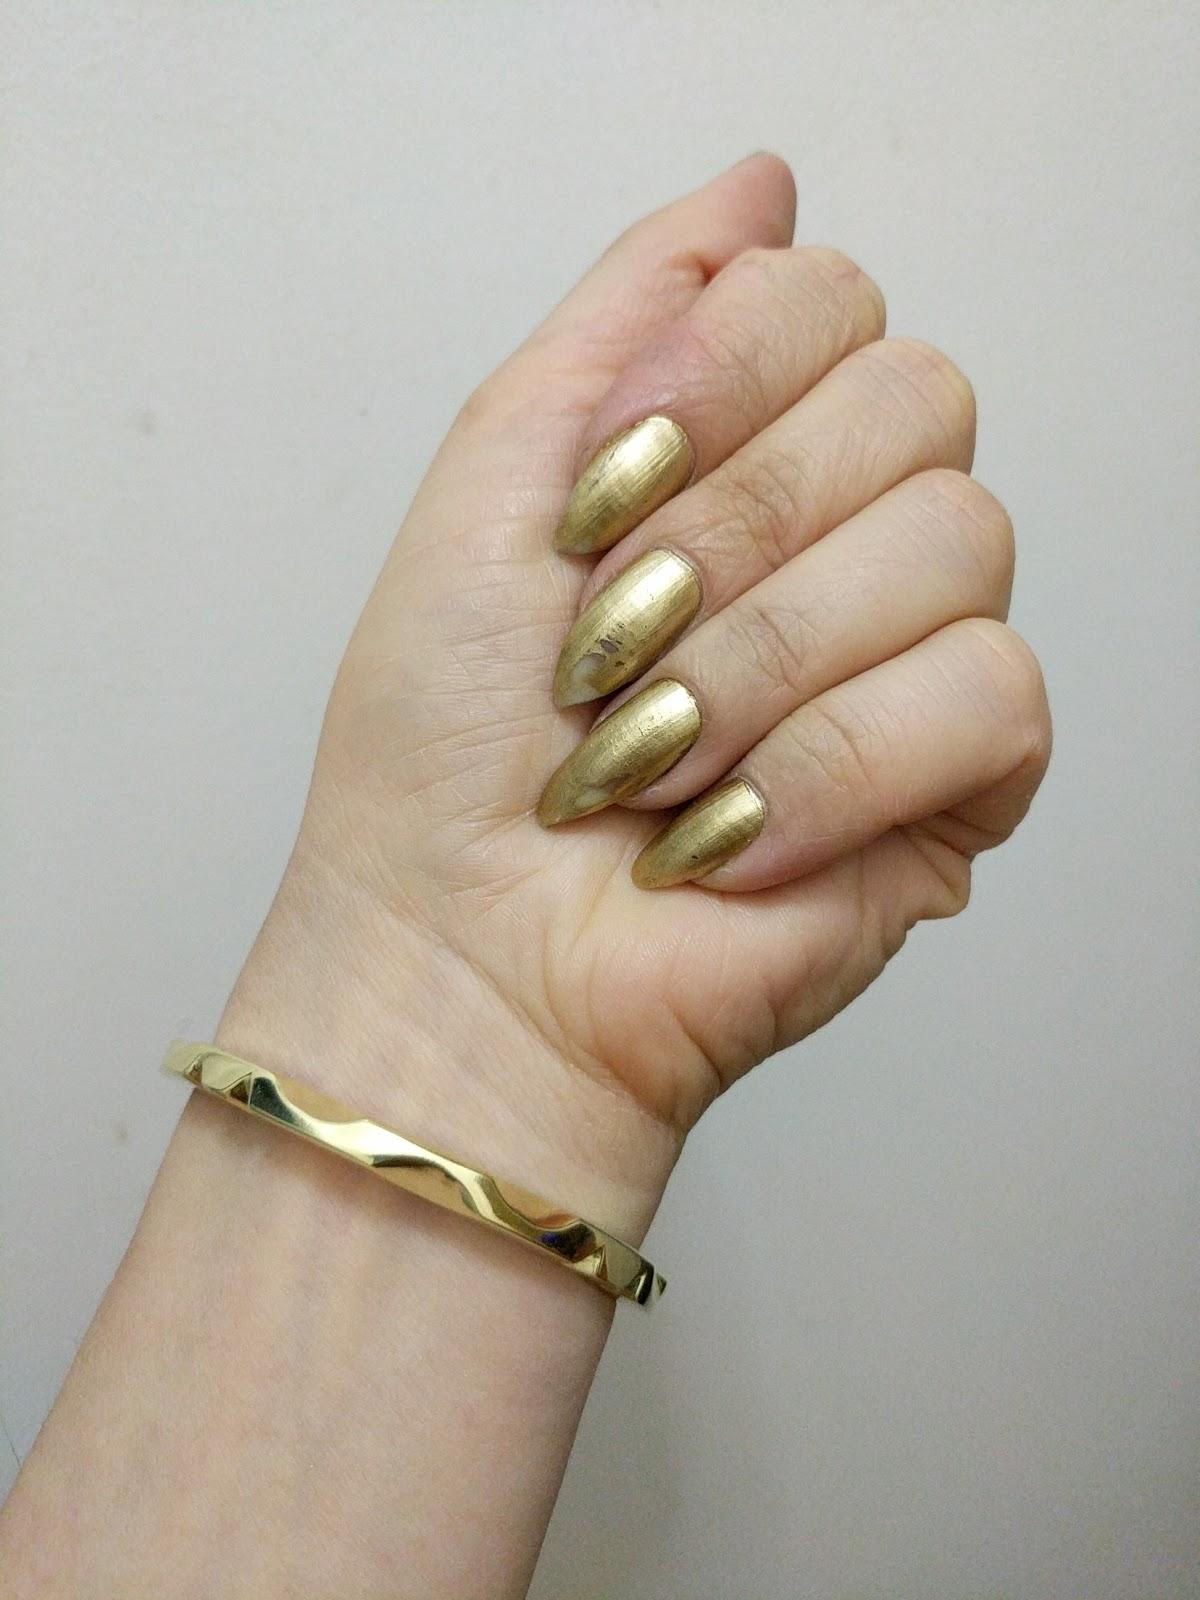 The Mutant Stomp Friends Jewelry 101 Annealed Br Bracelet